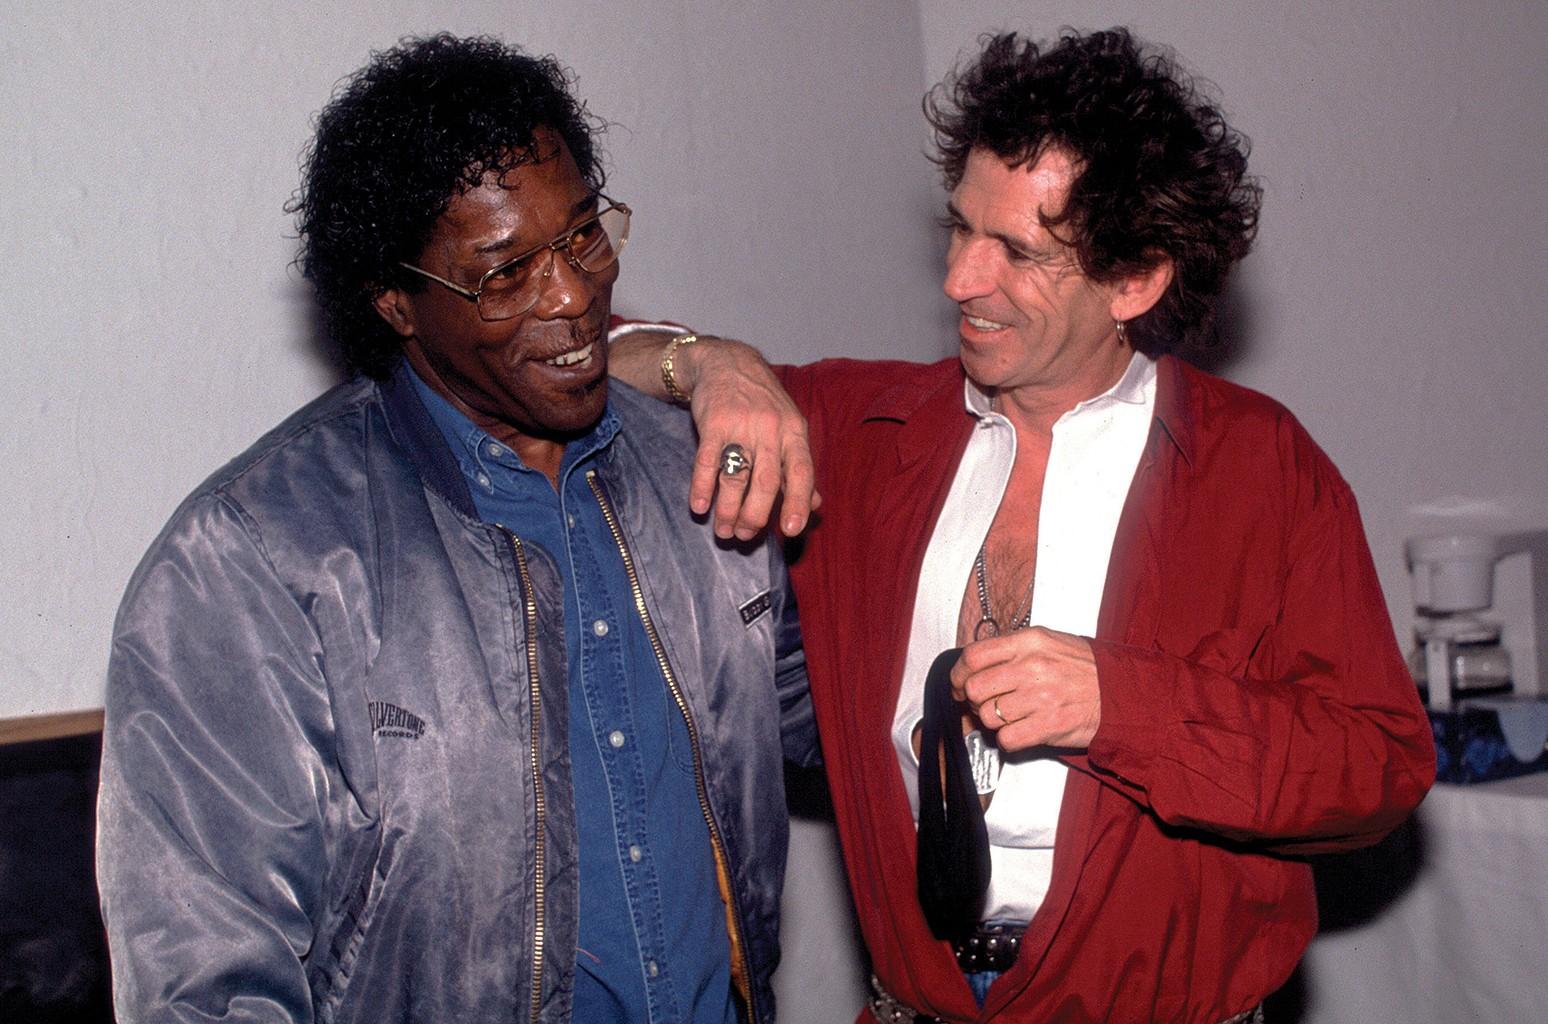 Buddy Guy & Keith Richards